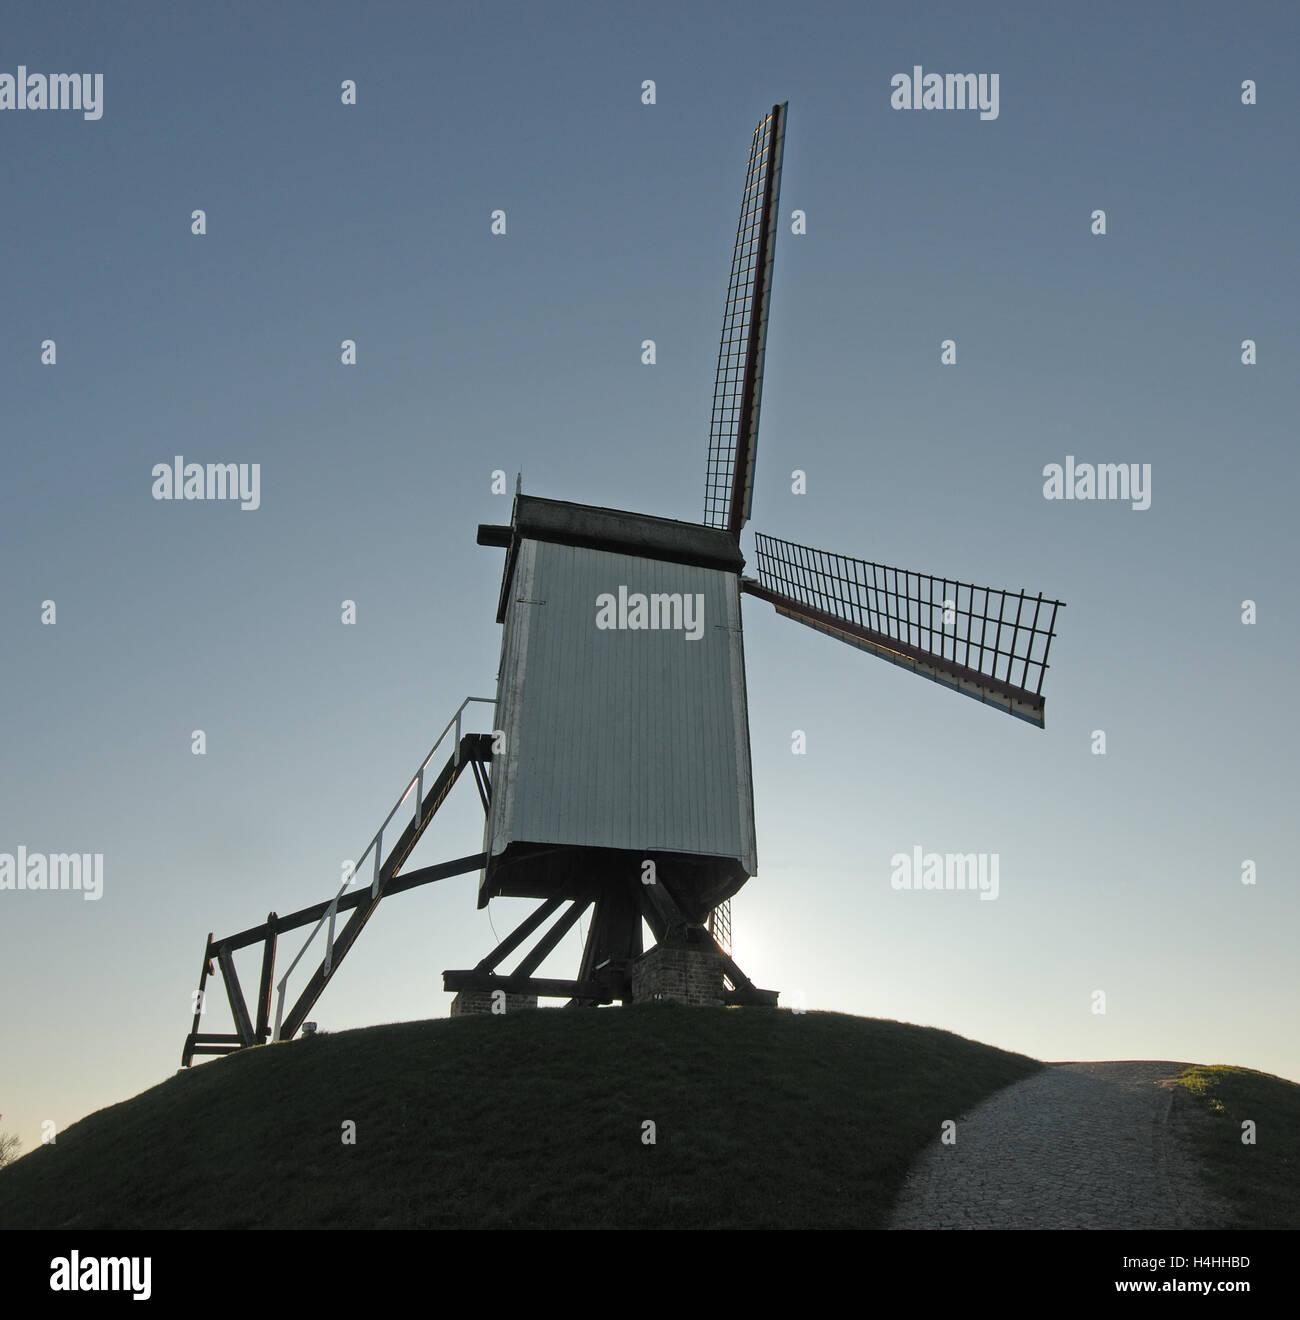 Old Flemish windmill in Brugge, Belgium. - Stock Image